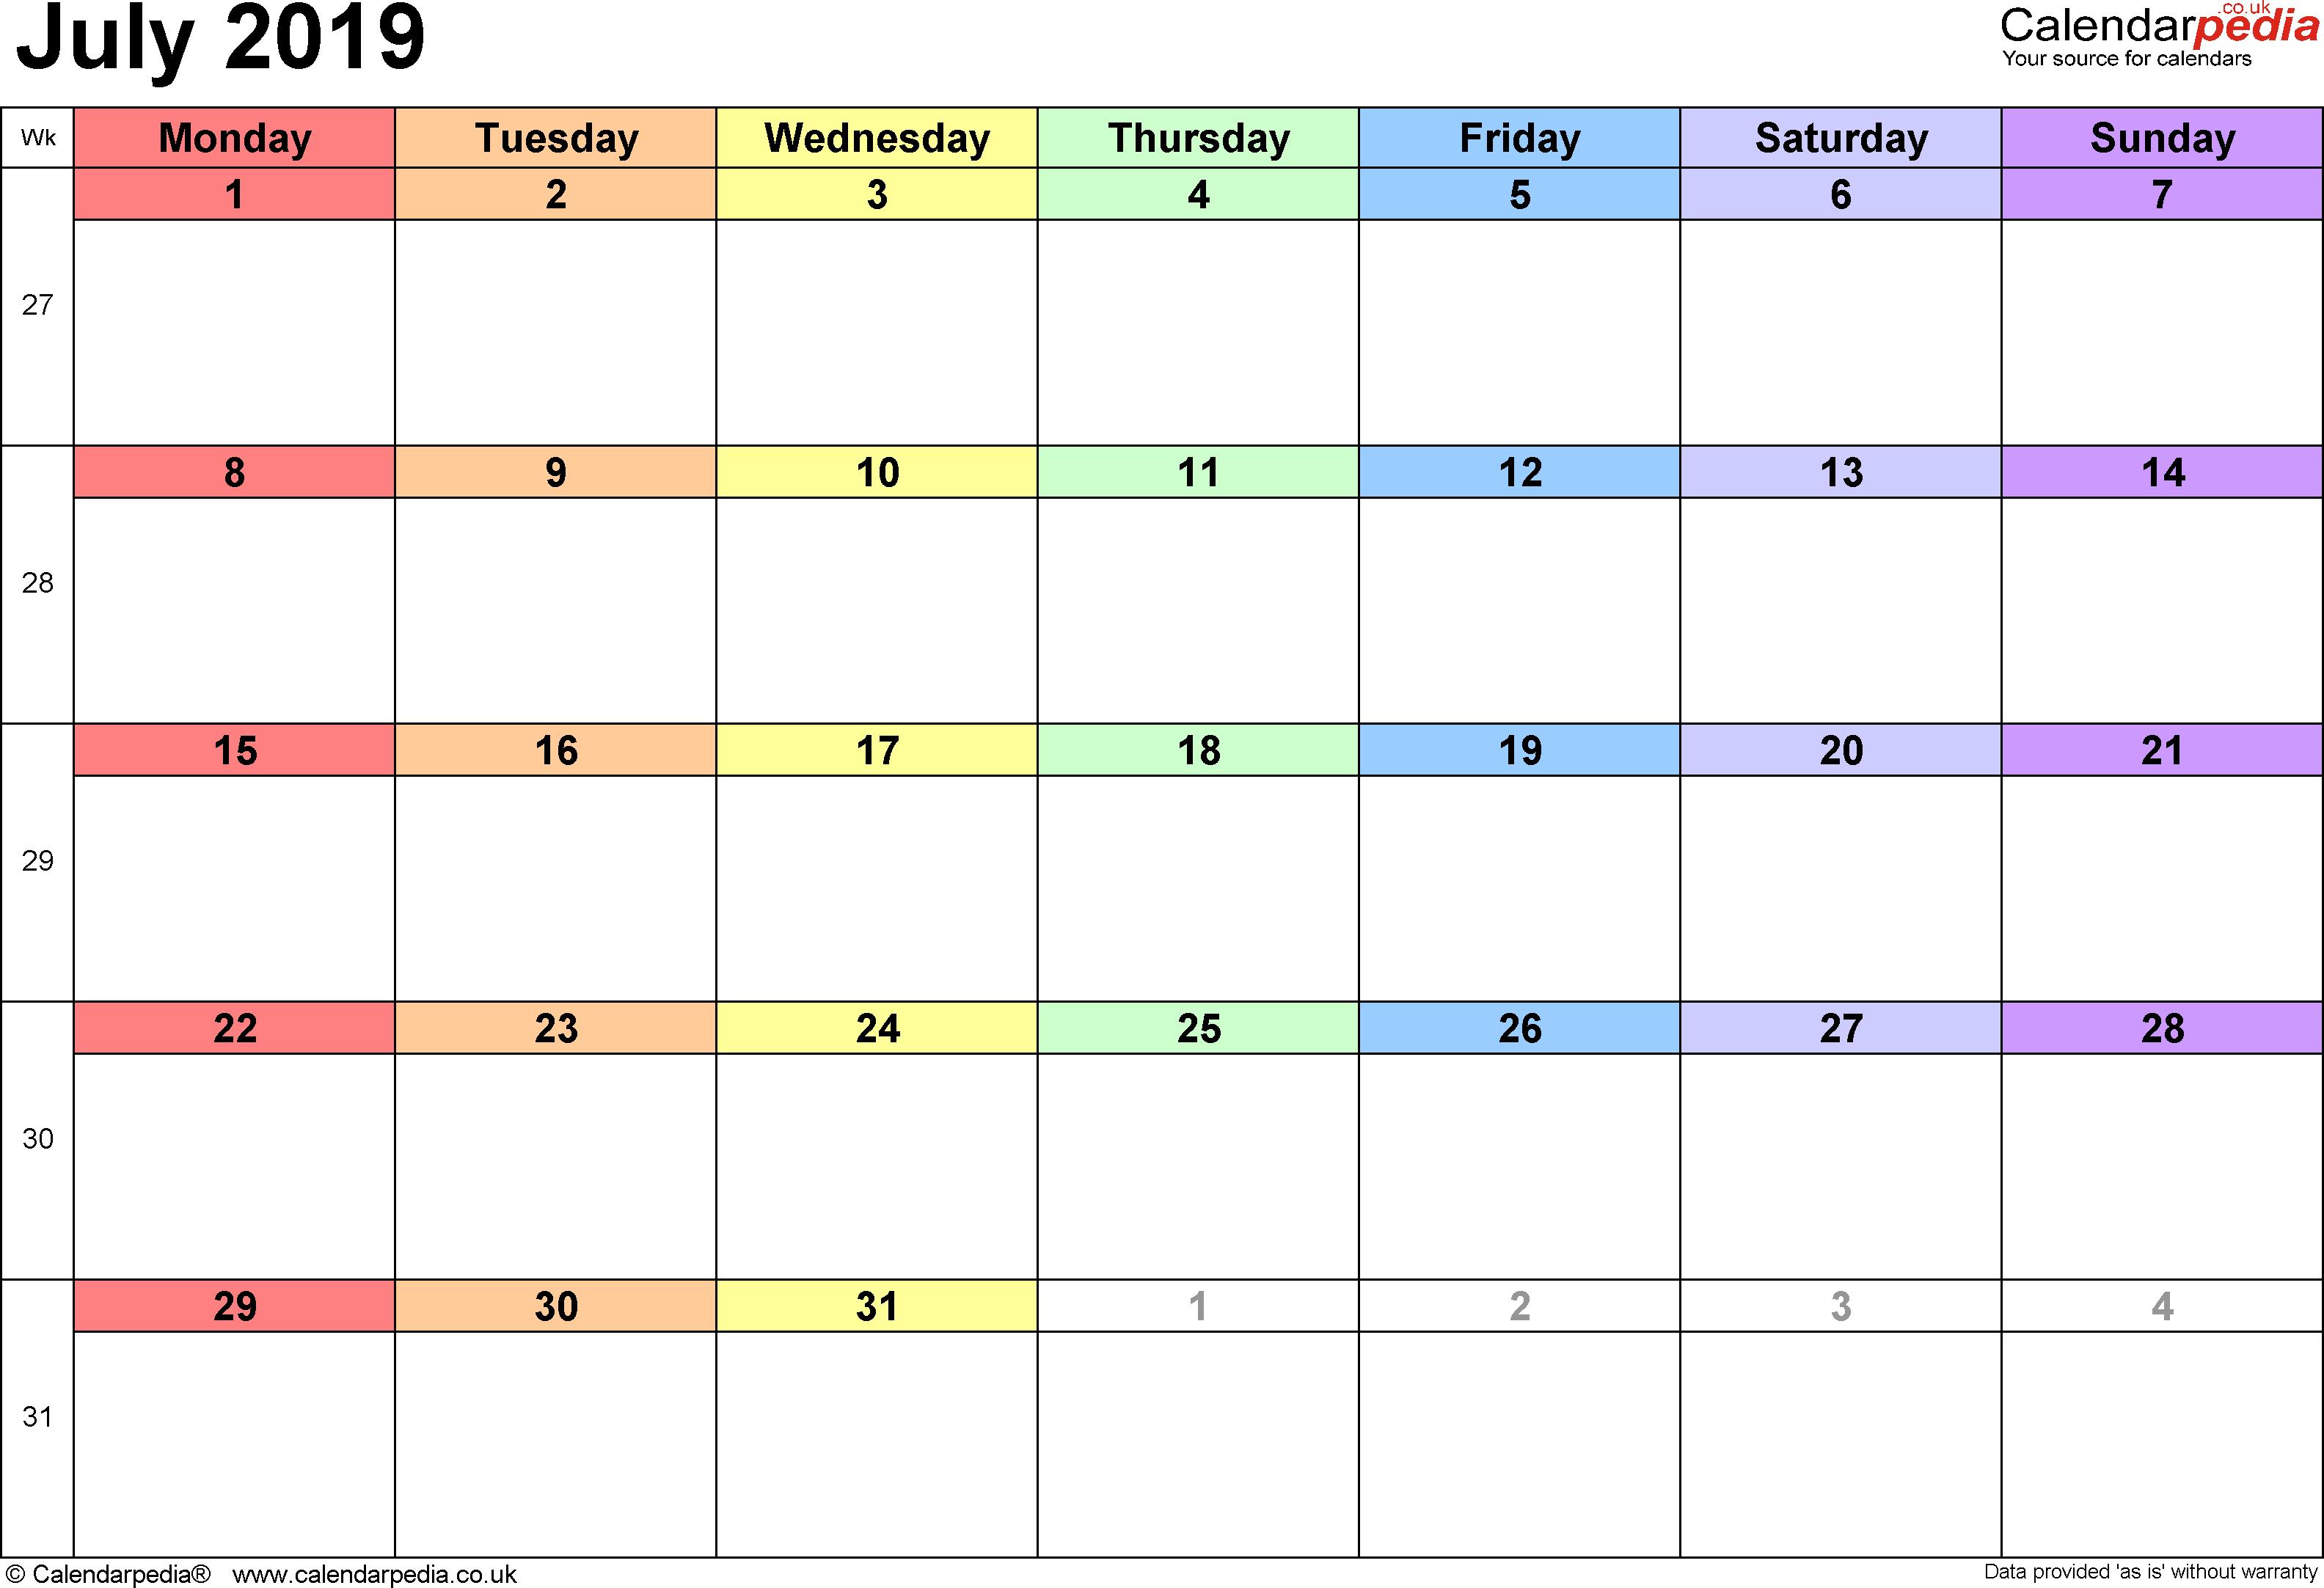 Calendar July 2019 Uk, Bank Holidays, Excel/pdf/word Templates Calendar 2019 Calendarpedia